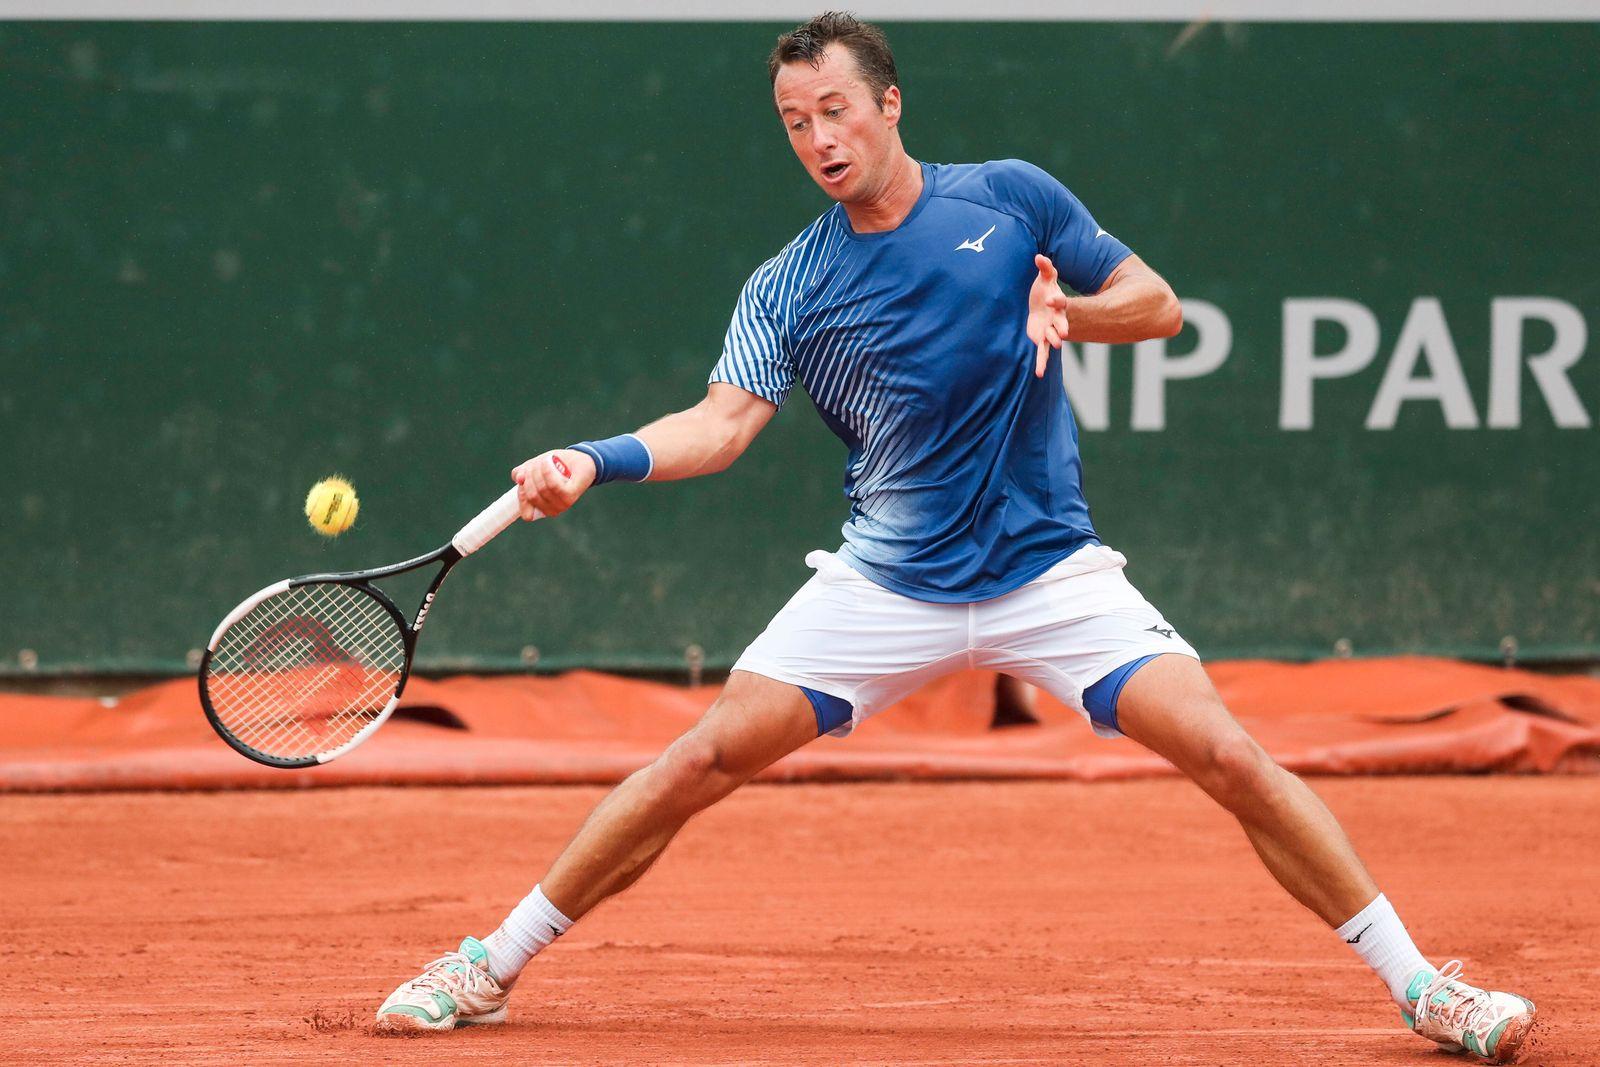 TENNIS - ATP, Tennis Herren French Open 2020 PARIS,FRANCE,29.SEP.20 - TENNIS - ATP World Tour, French Open, Roland Garr